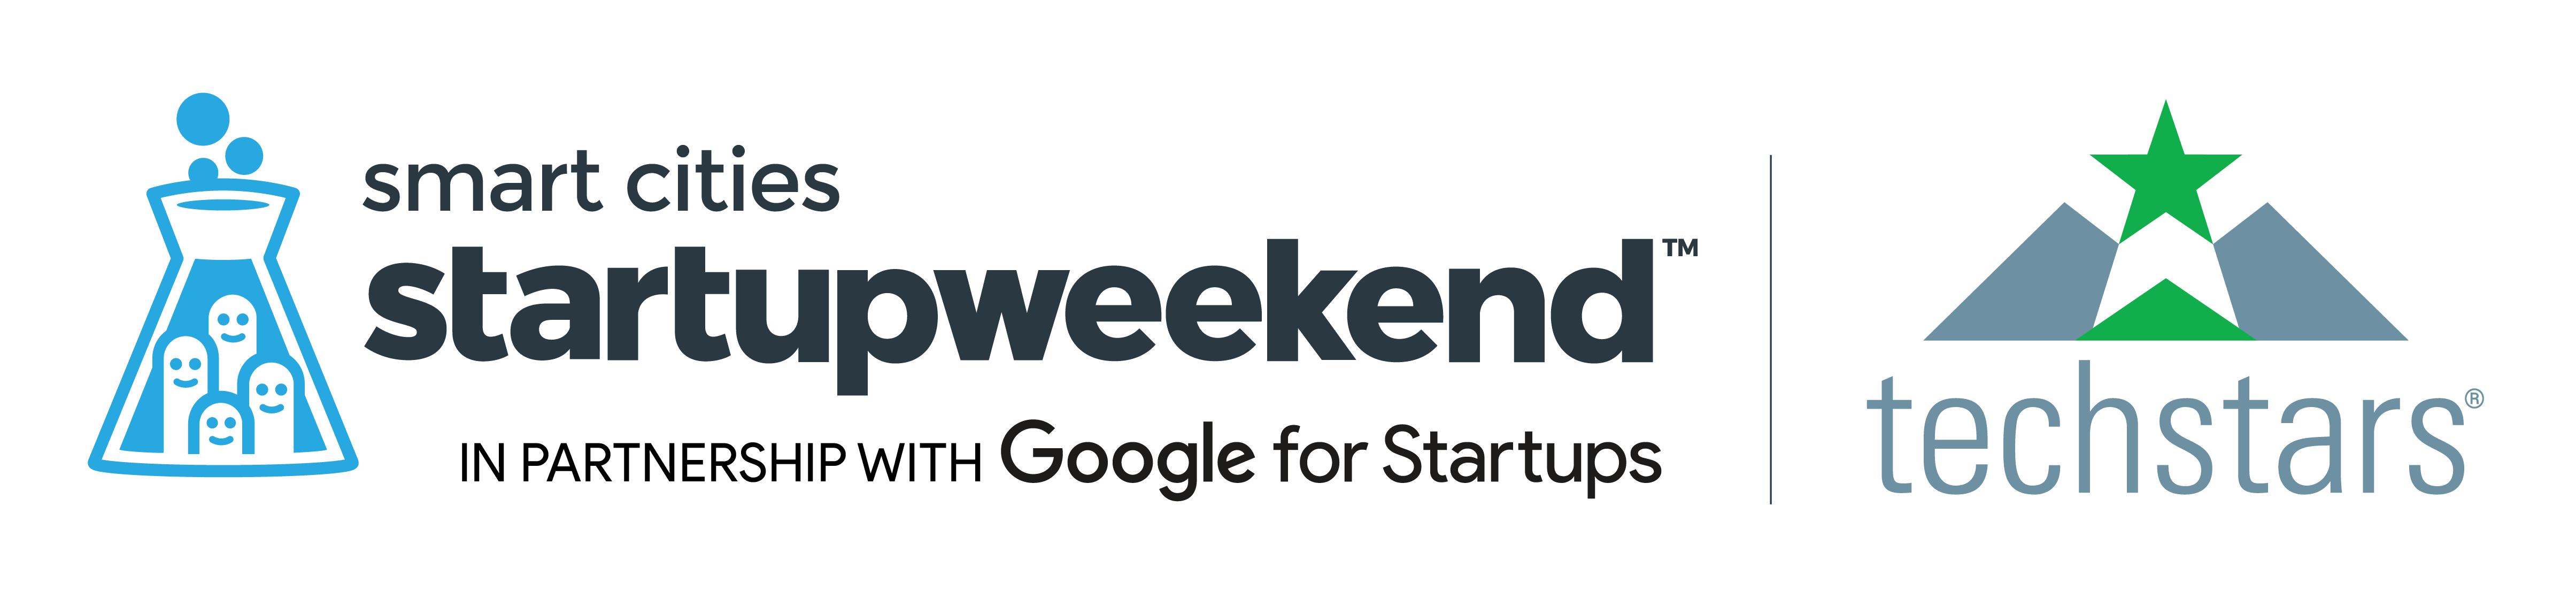 Techstars Startup Weekend - Oakville Jun 14-16 2019